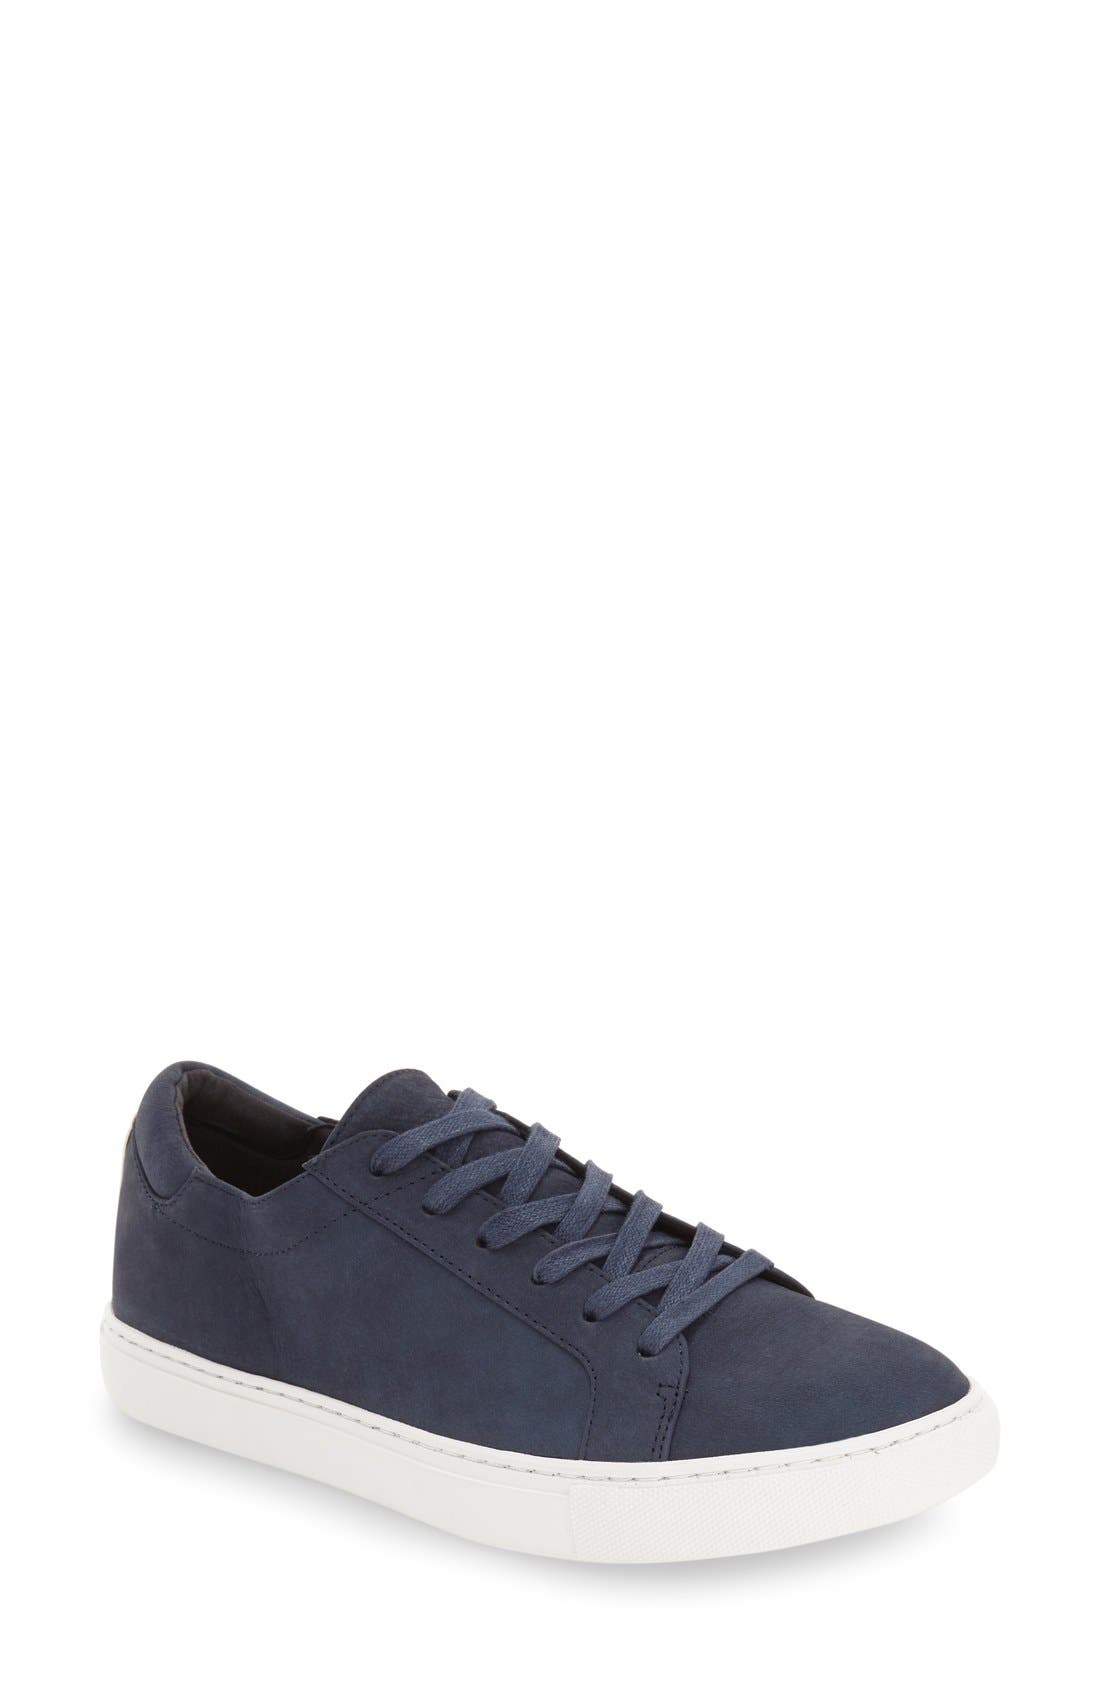 'Kam' Sneaker,                         Main,                         color, Navy Nubuck Leather